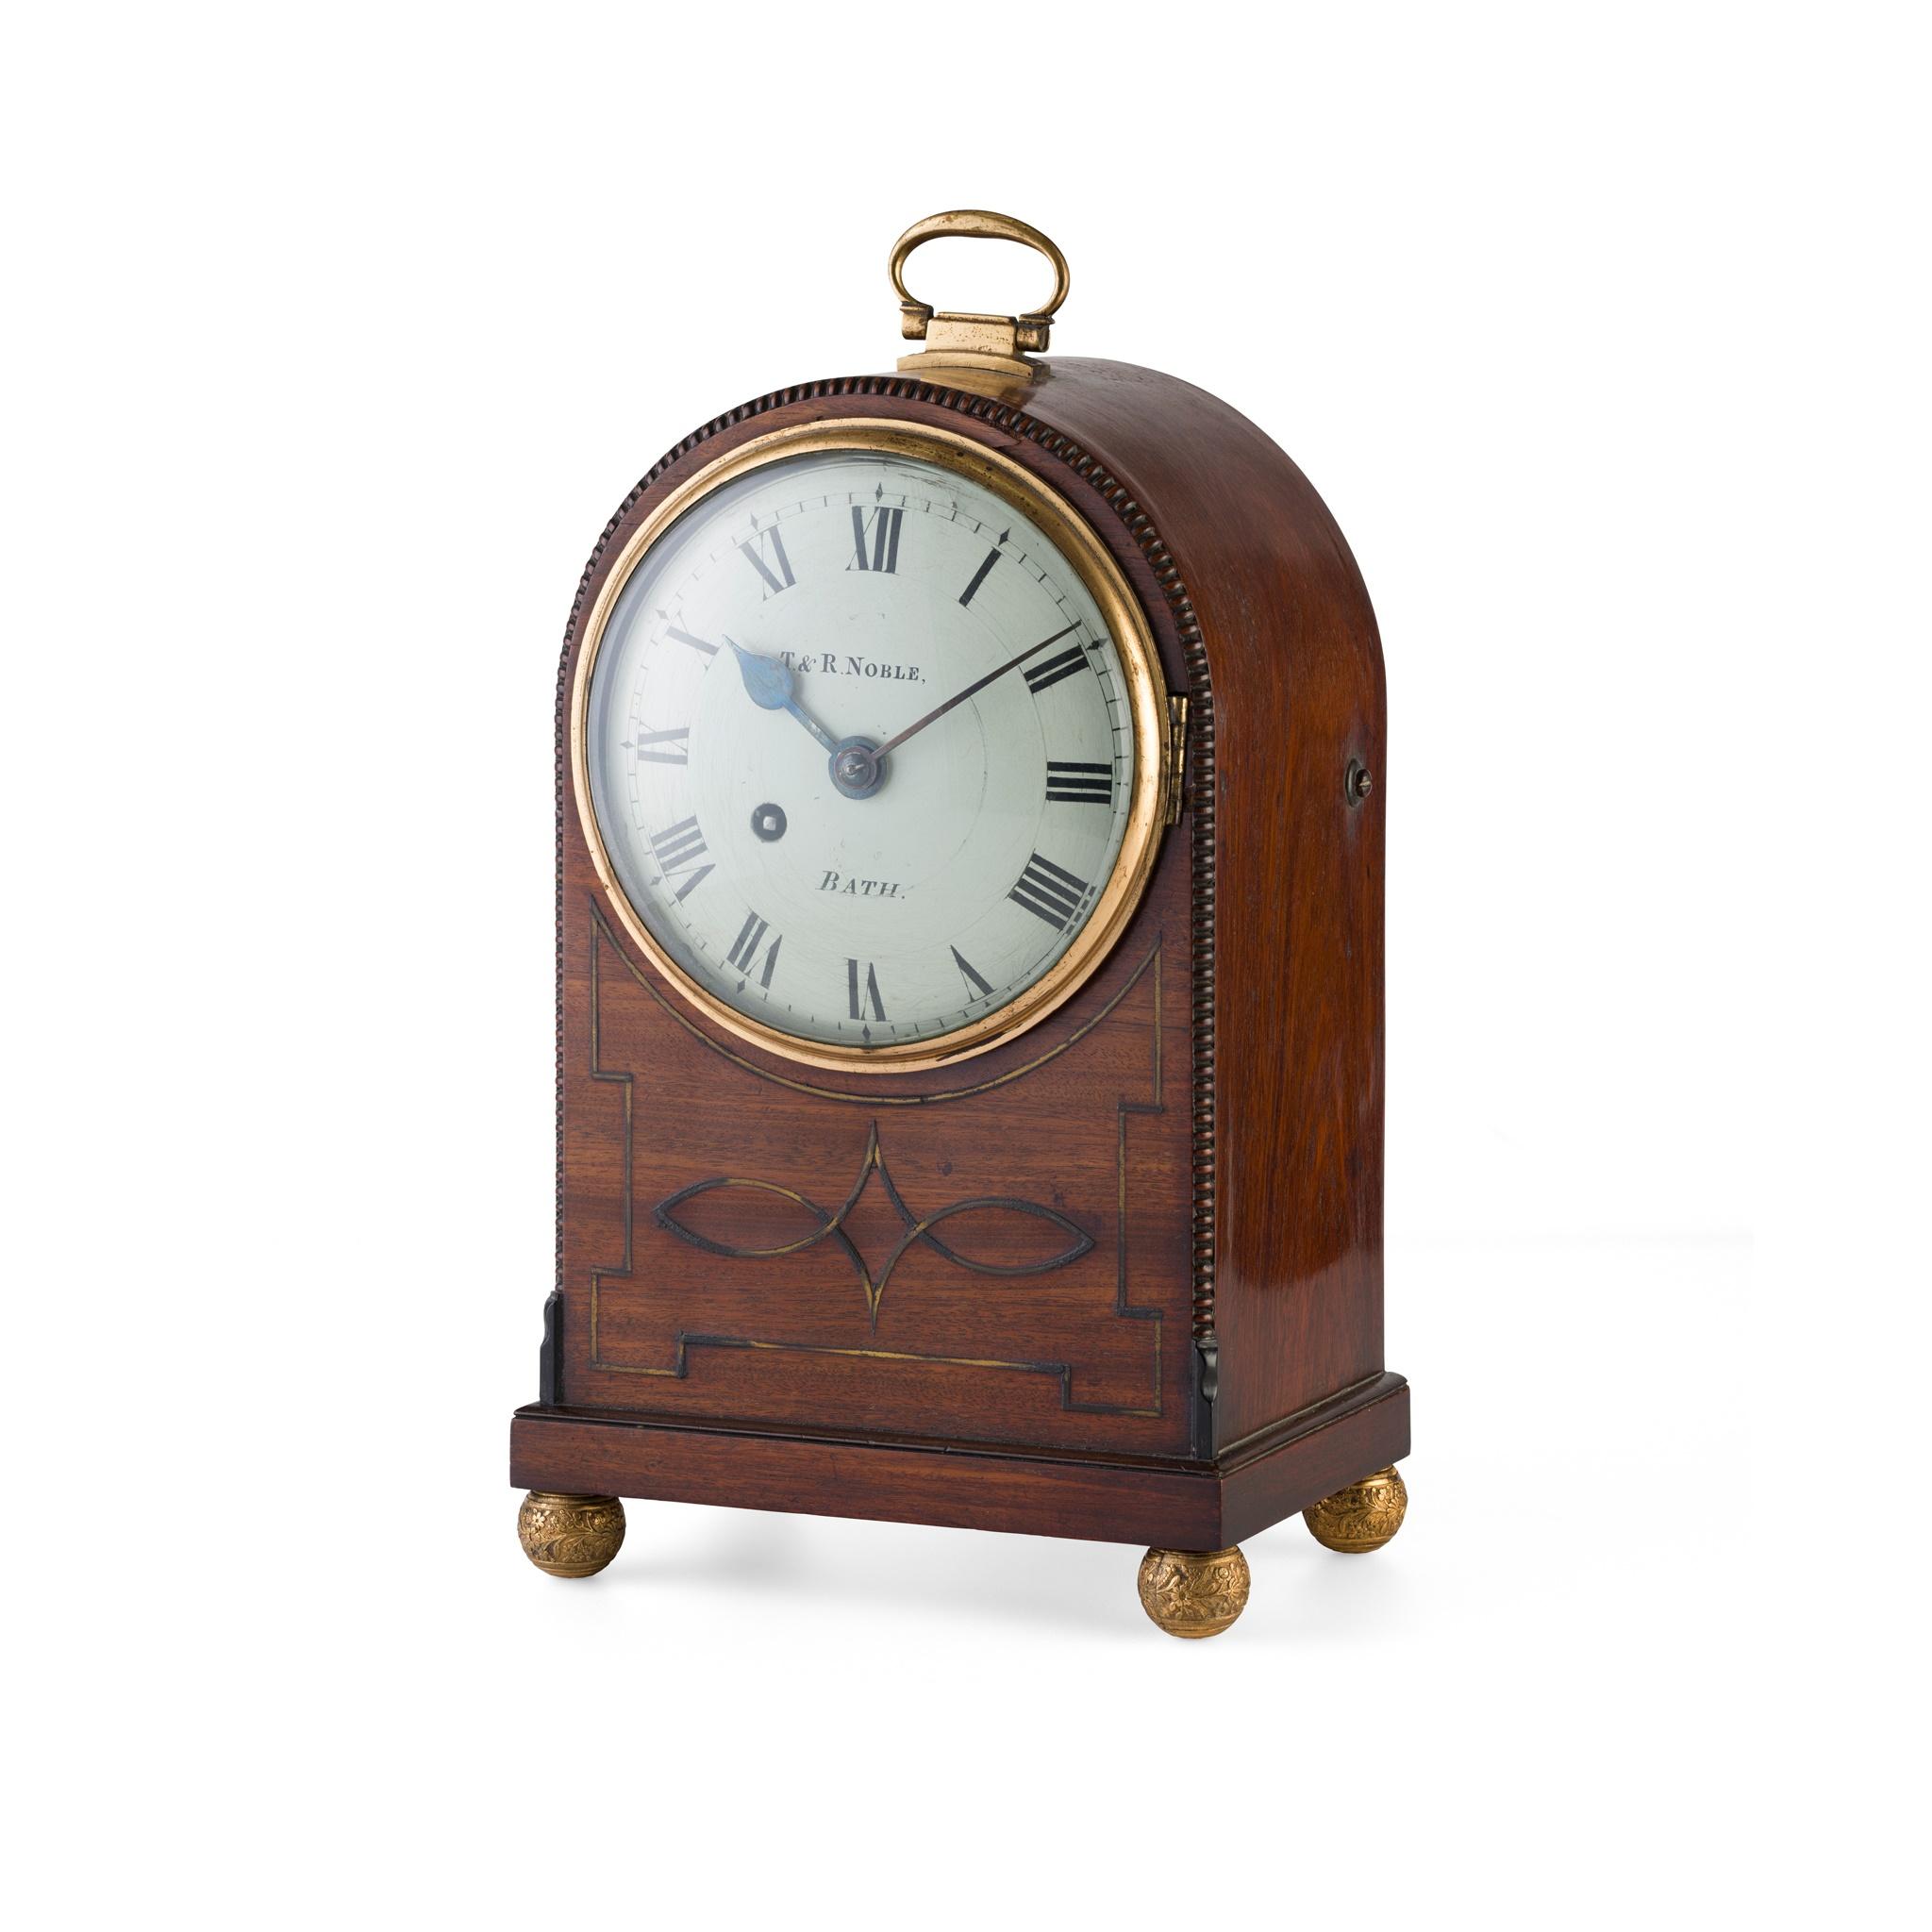 REGENCY MAHOGANY BRASS INLAID MANTLE CLOCK, T & R NOBLE, BATH EARLY 19TH CENTURY